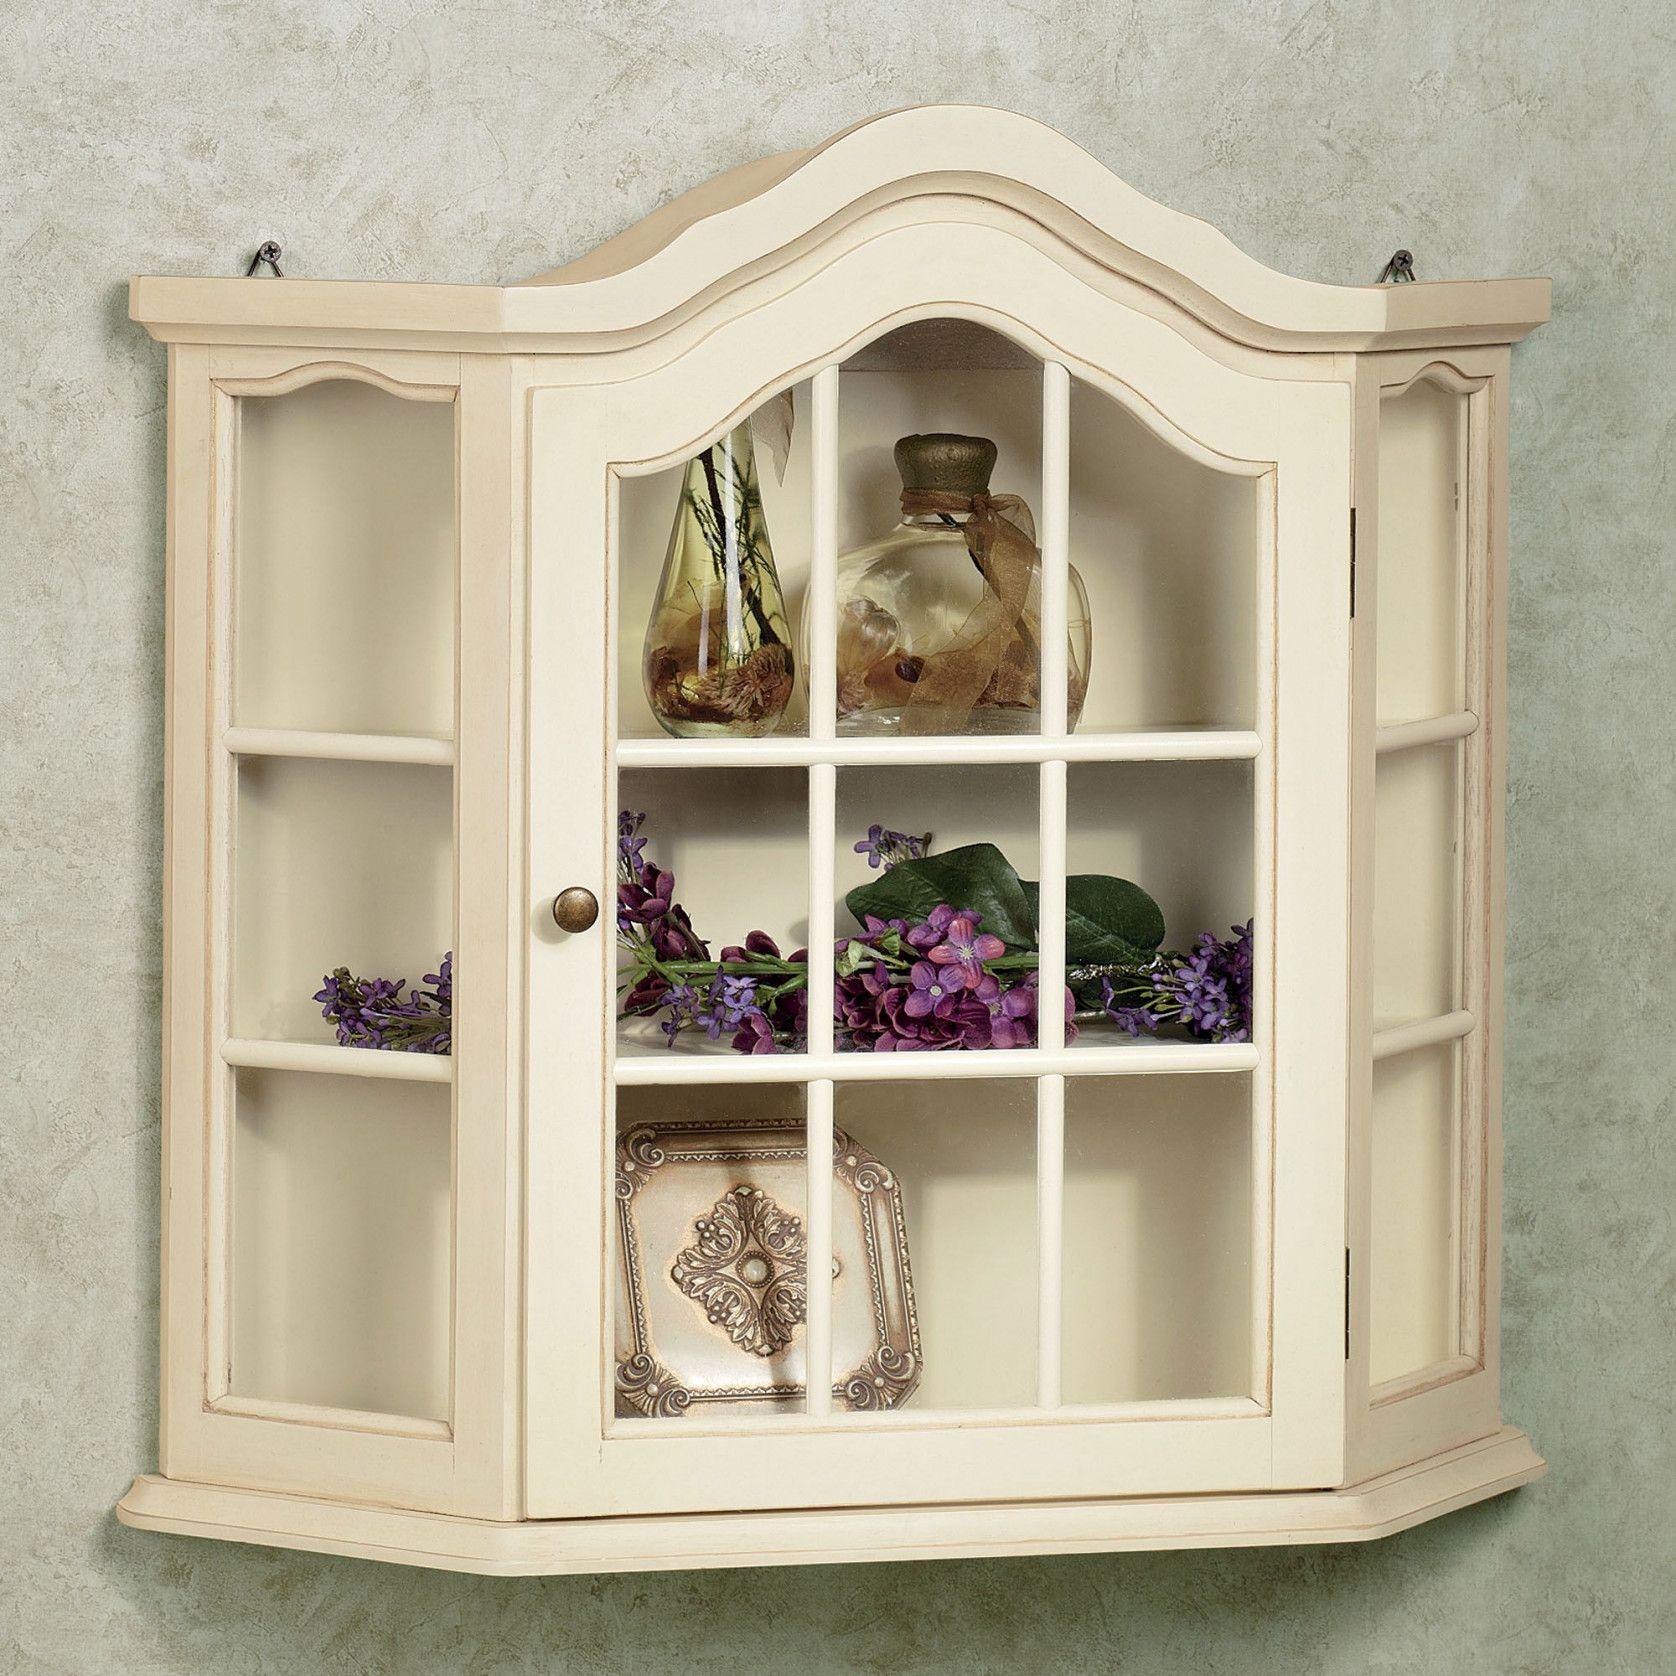 50 Small Wall Display Cabinet Kitchen Floor Vinyl Ideas Check